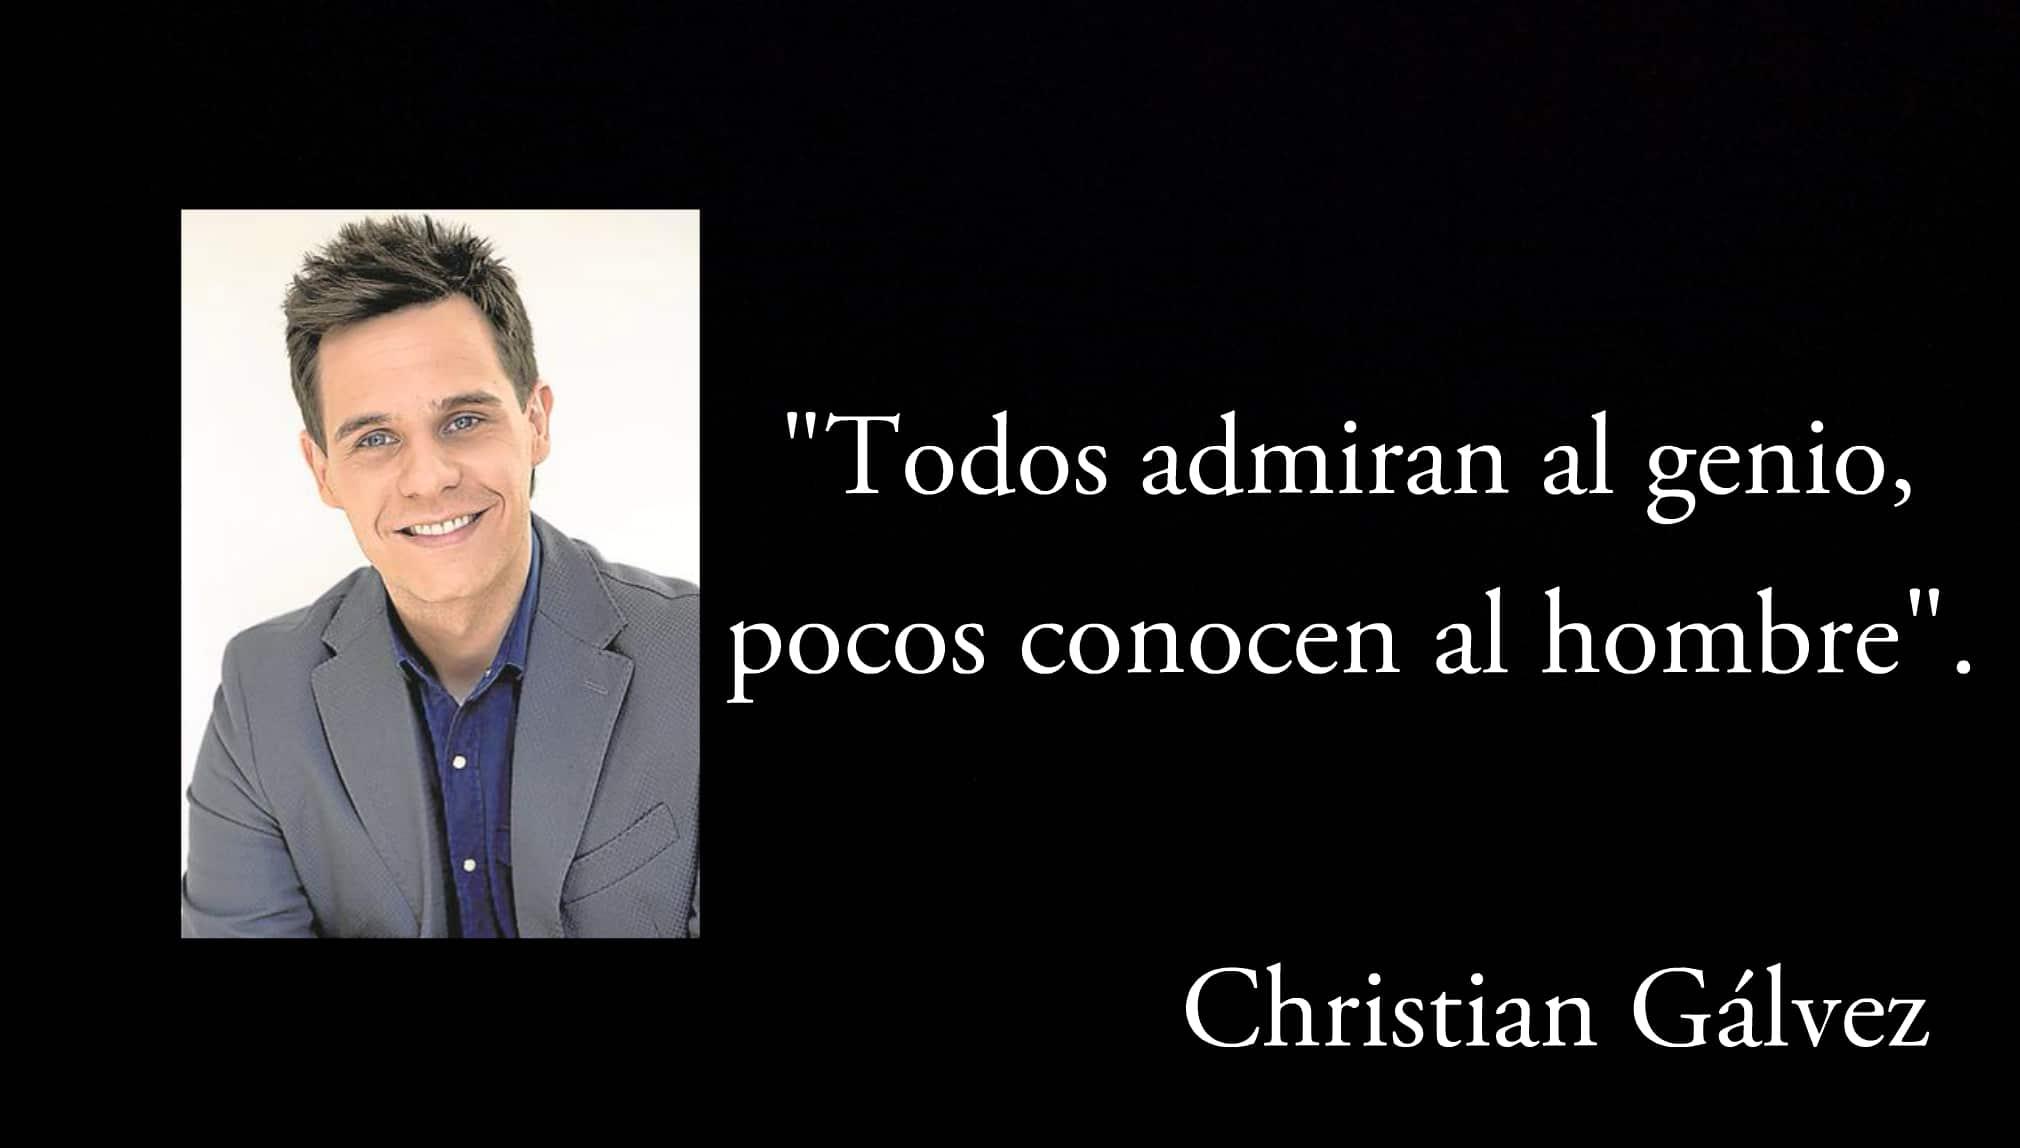 Frase de Christian Gálvez.